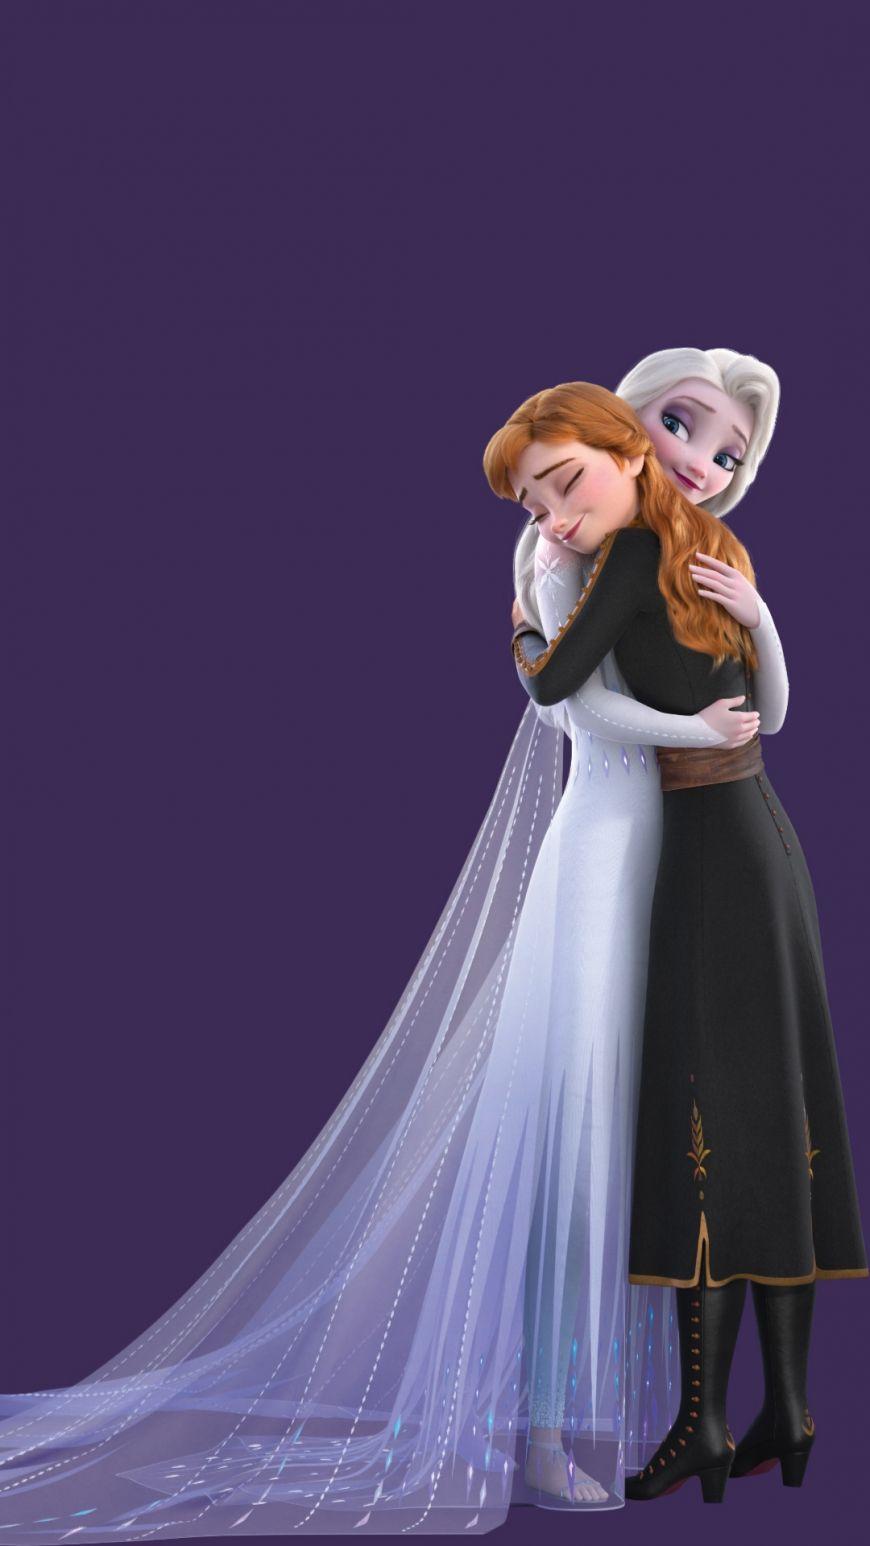 Frozen 2 Hd Background Mobile Elsa Hugs Anna In 2020 Disney Princess Elsa Disney Princess Pictures Frozen Disney Movie